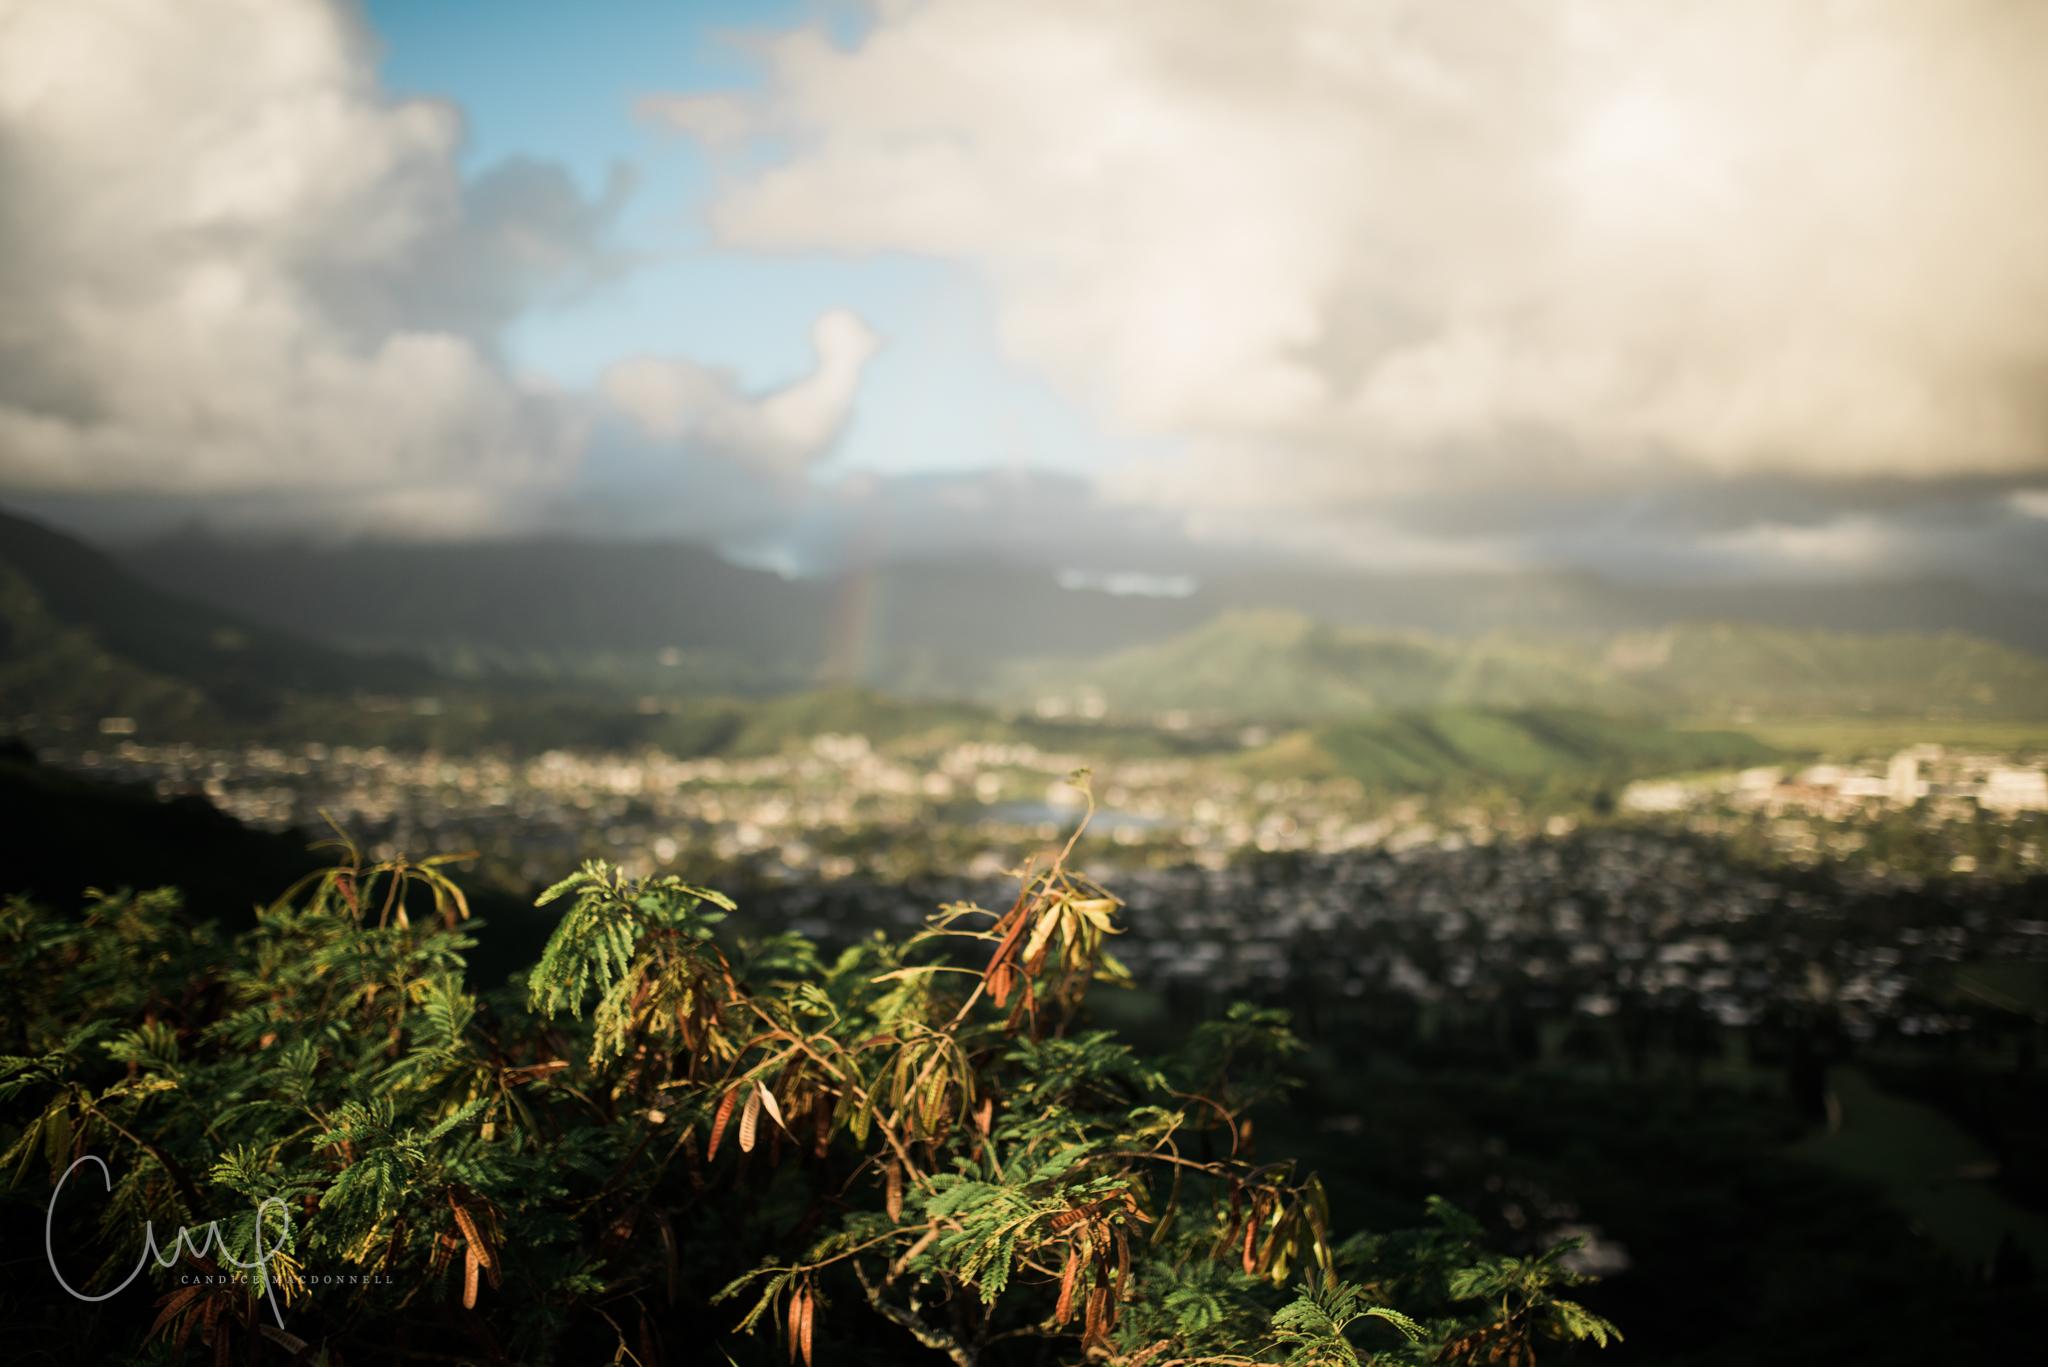 plants at pillboxes lanikai oahu hawaii pretty clouds